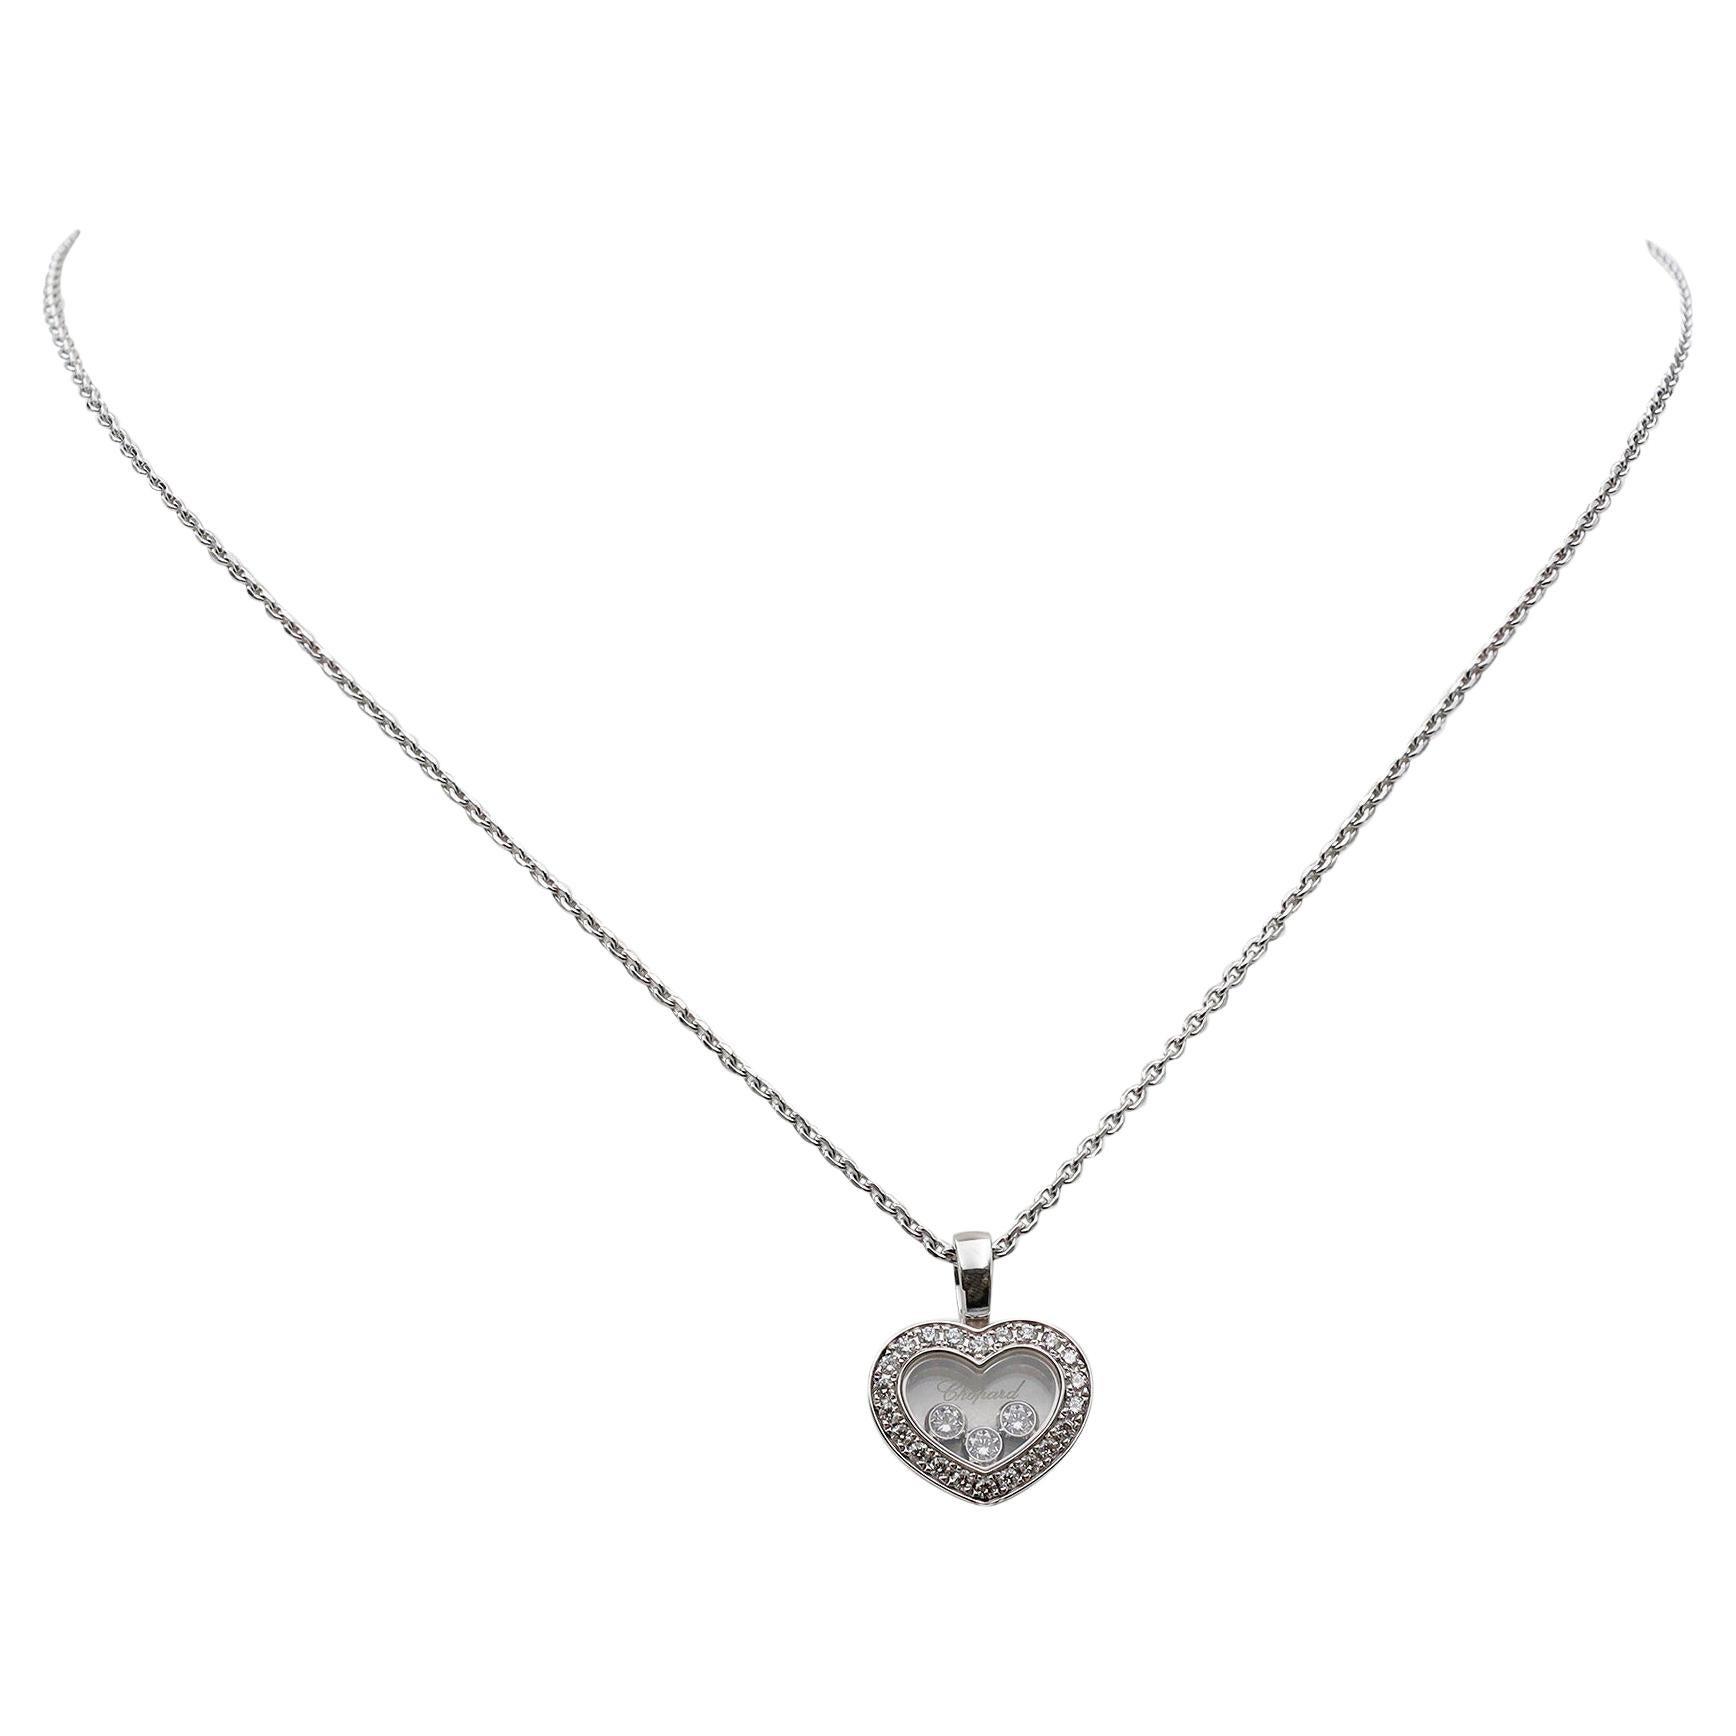 Chopard Happy Diamonds White Gold Heart Pendant Necklace